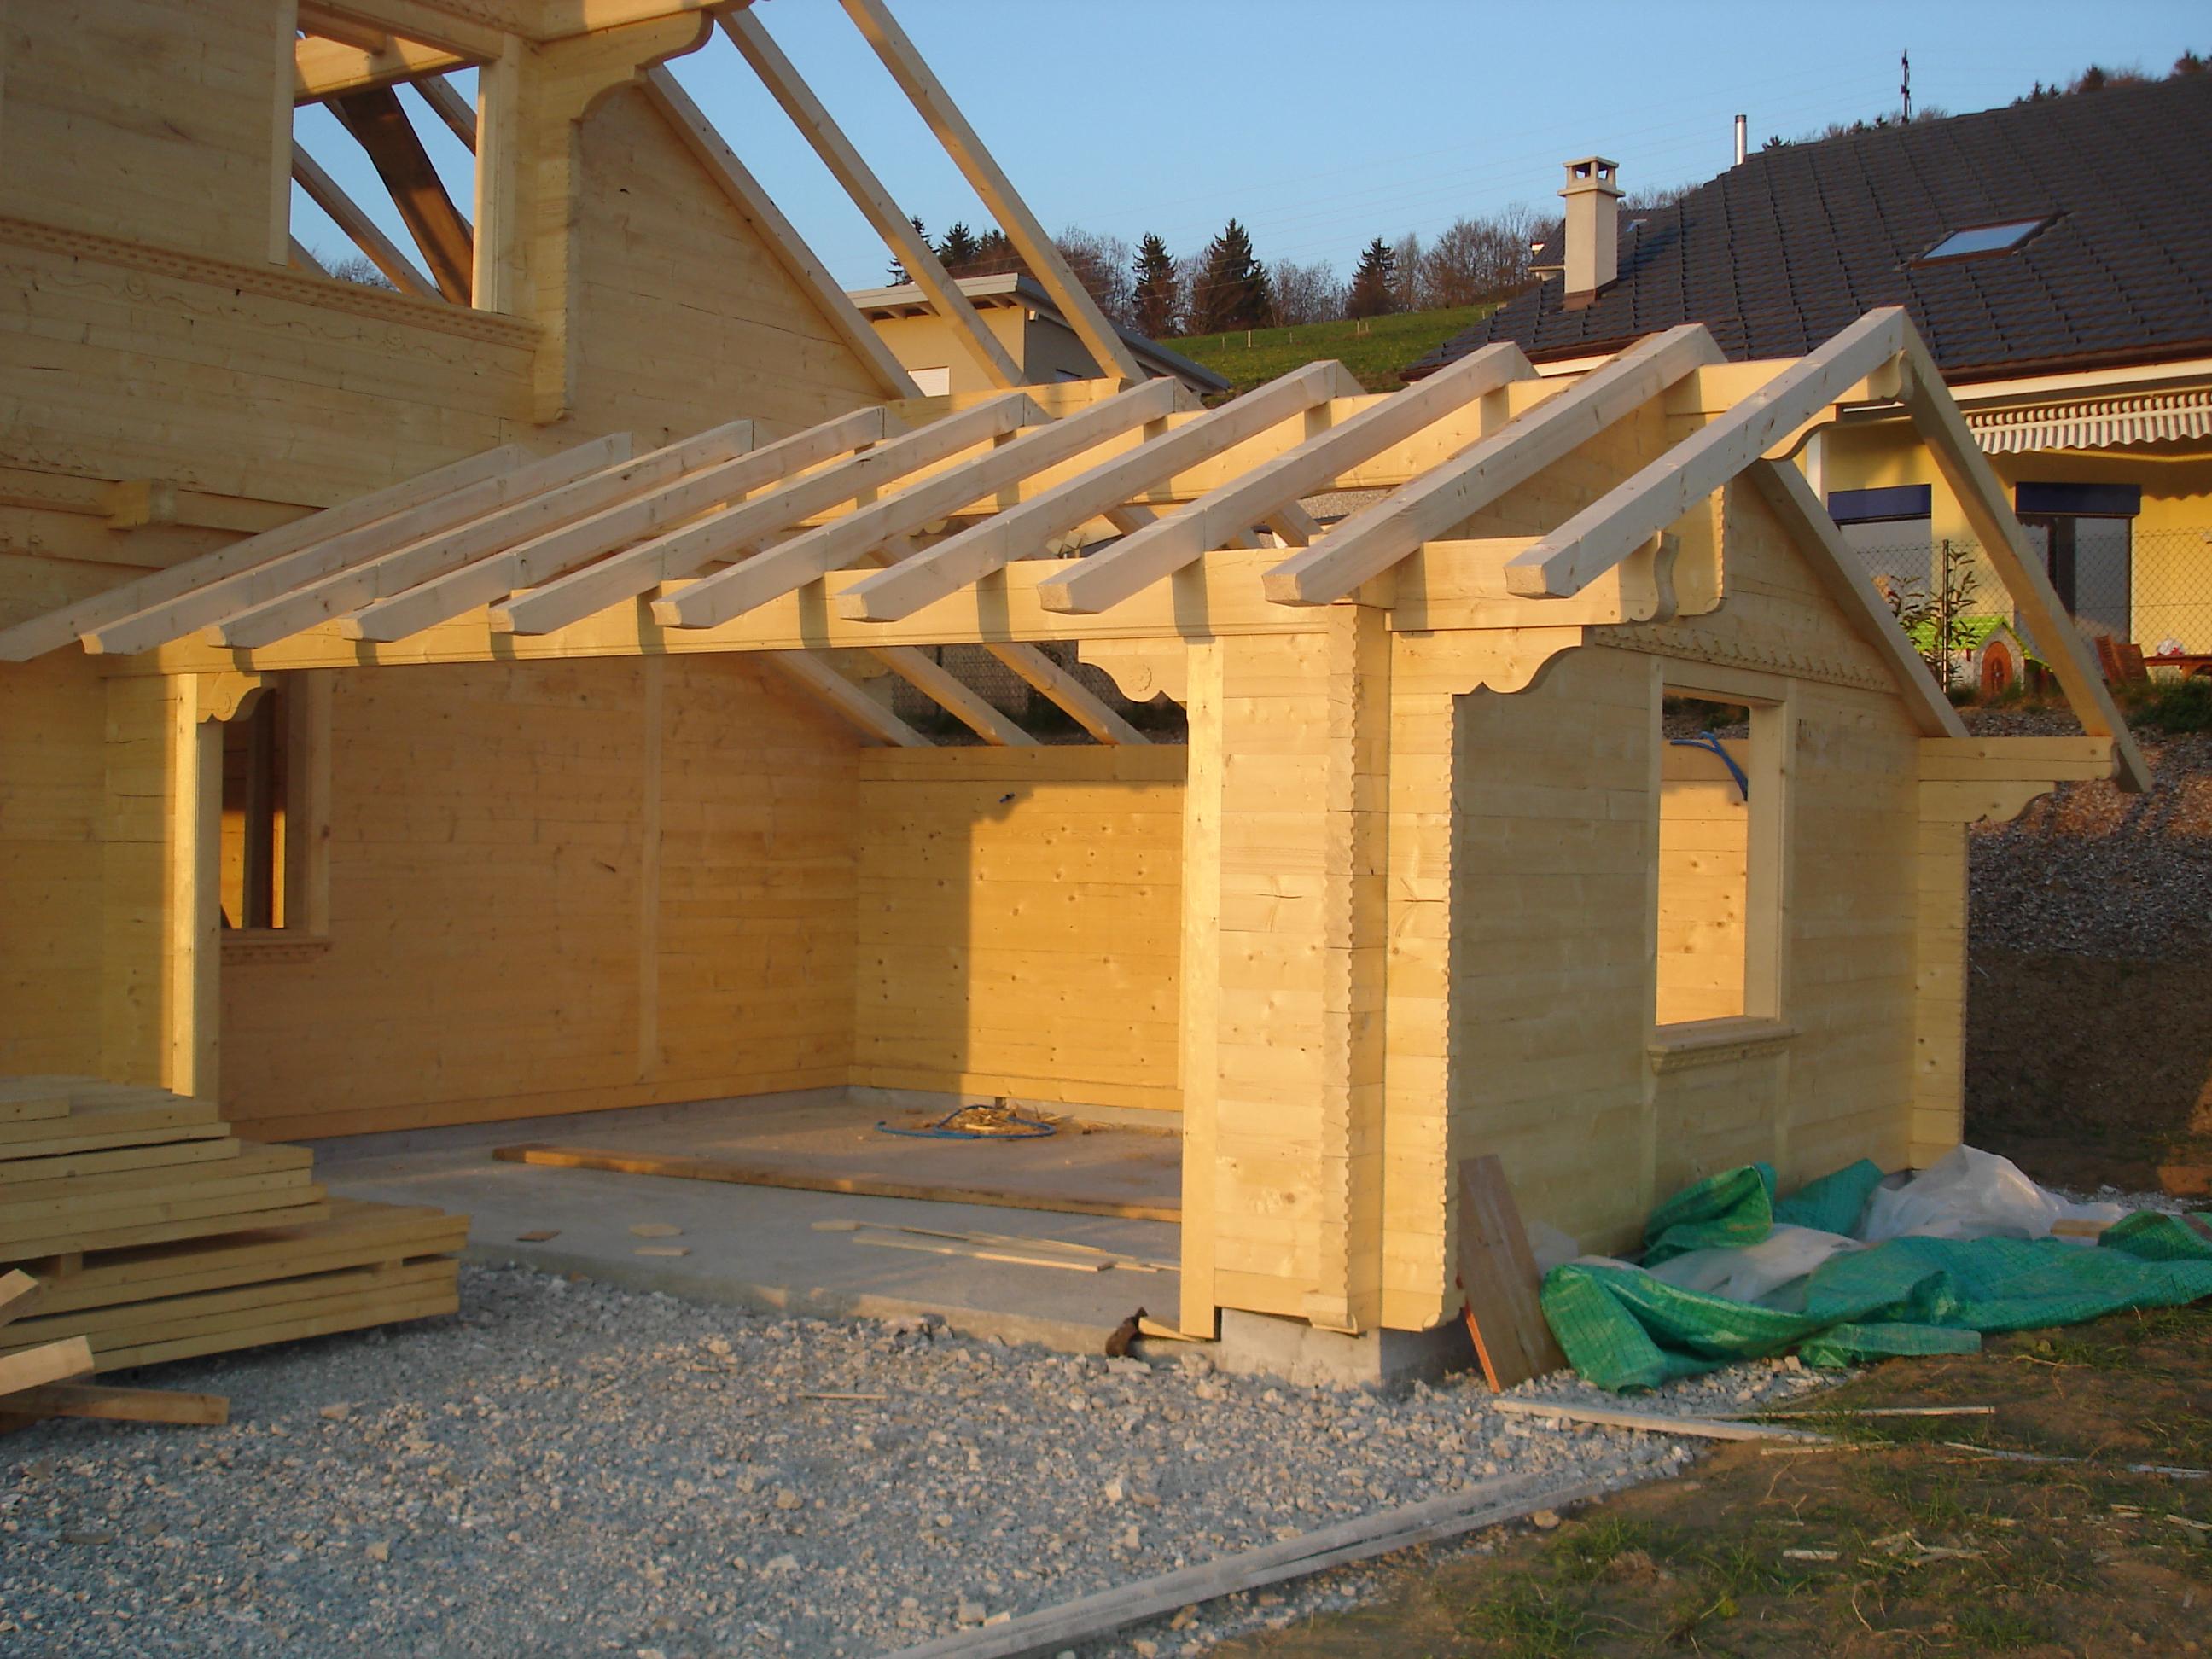 Charpente, couverture, ferblanterie, toiture à Bulle ...